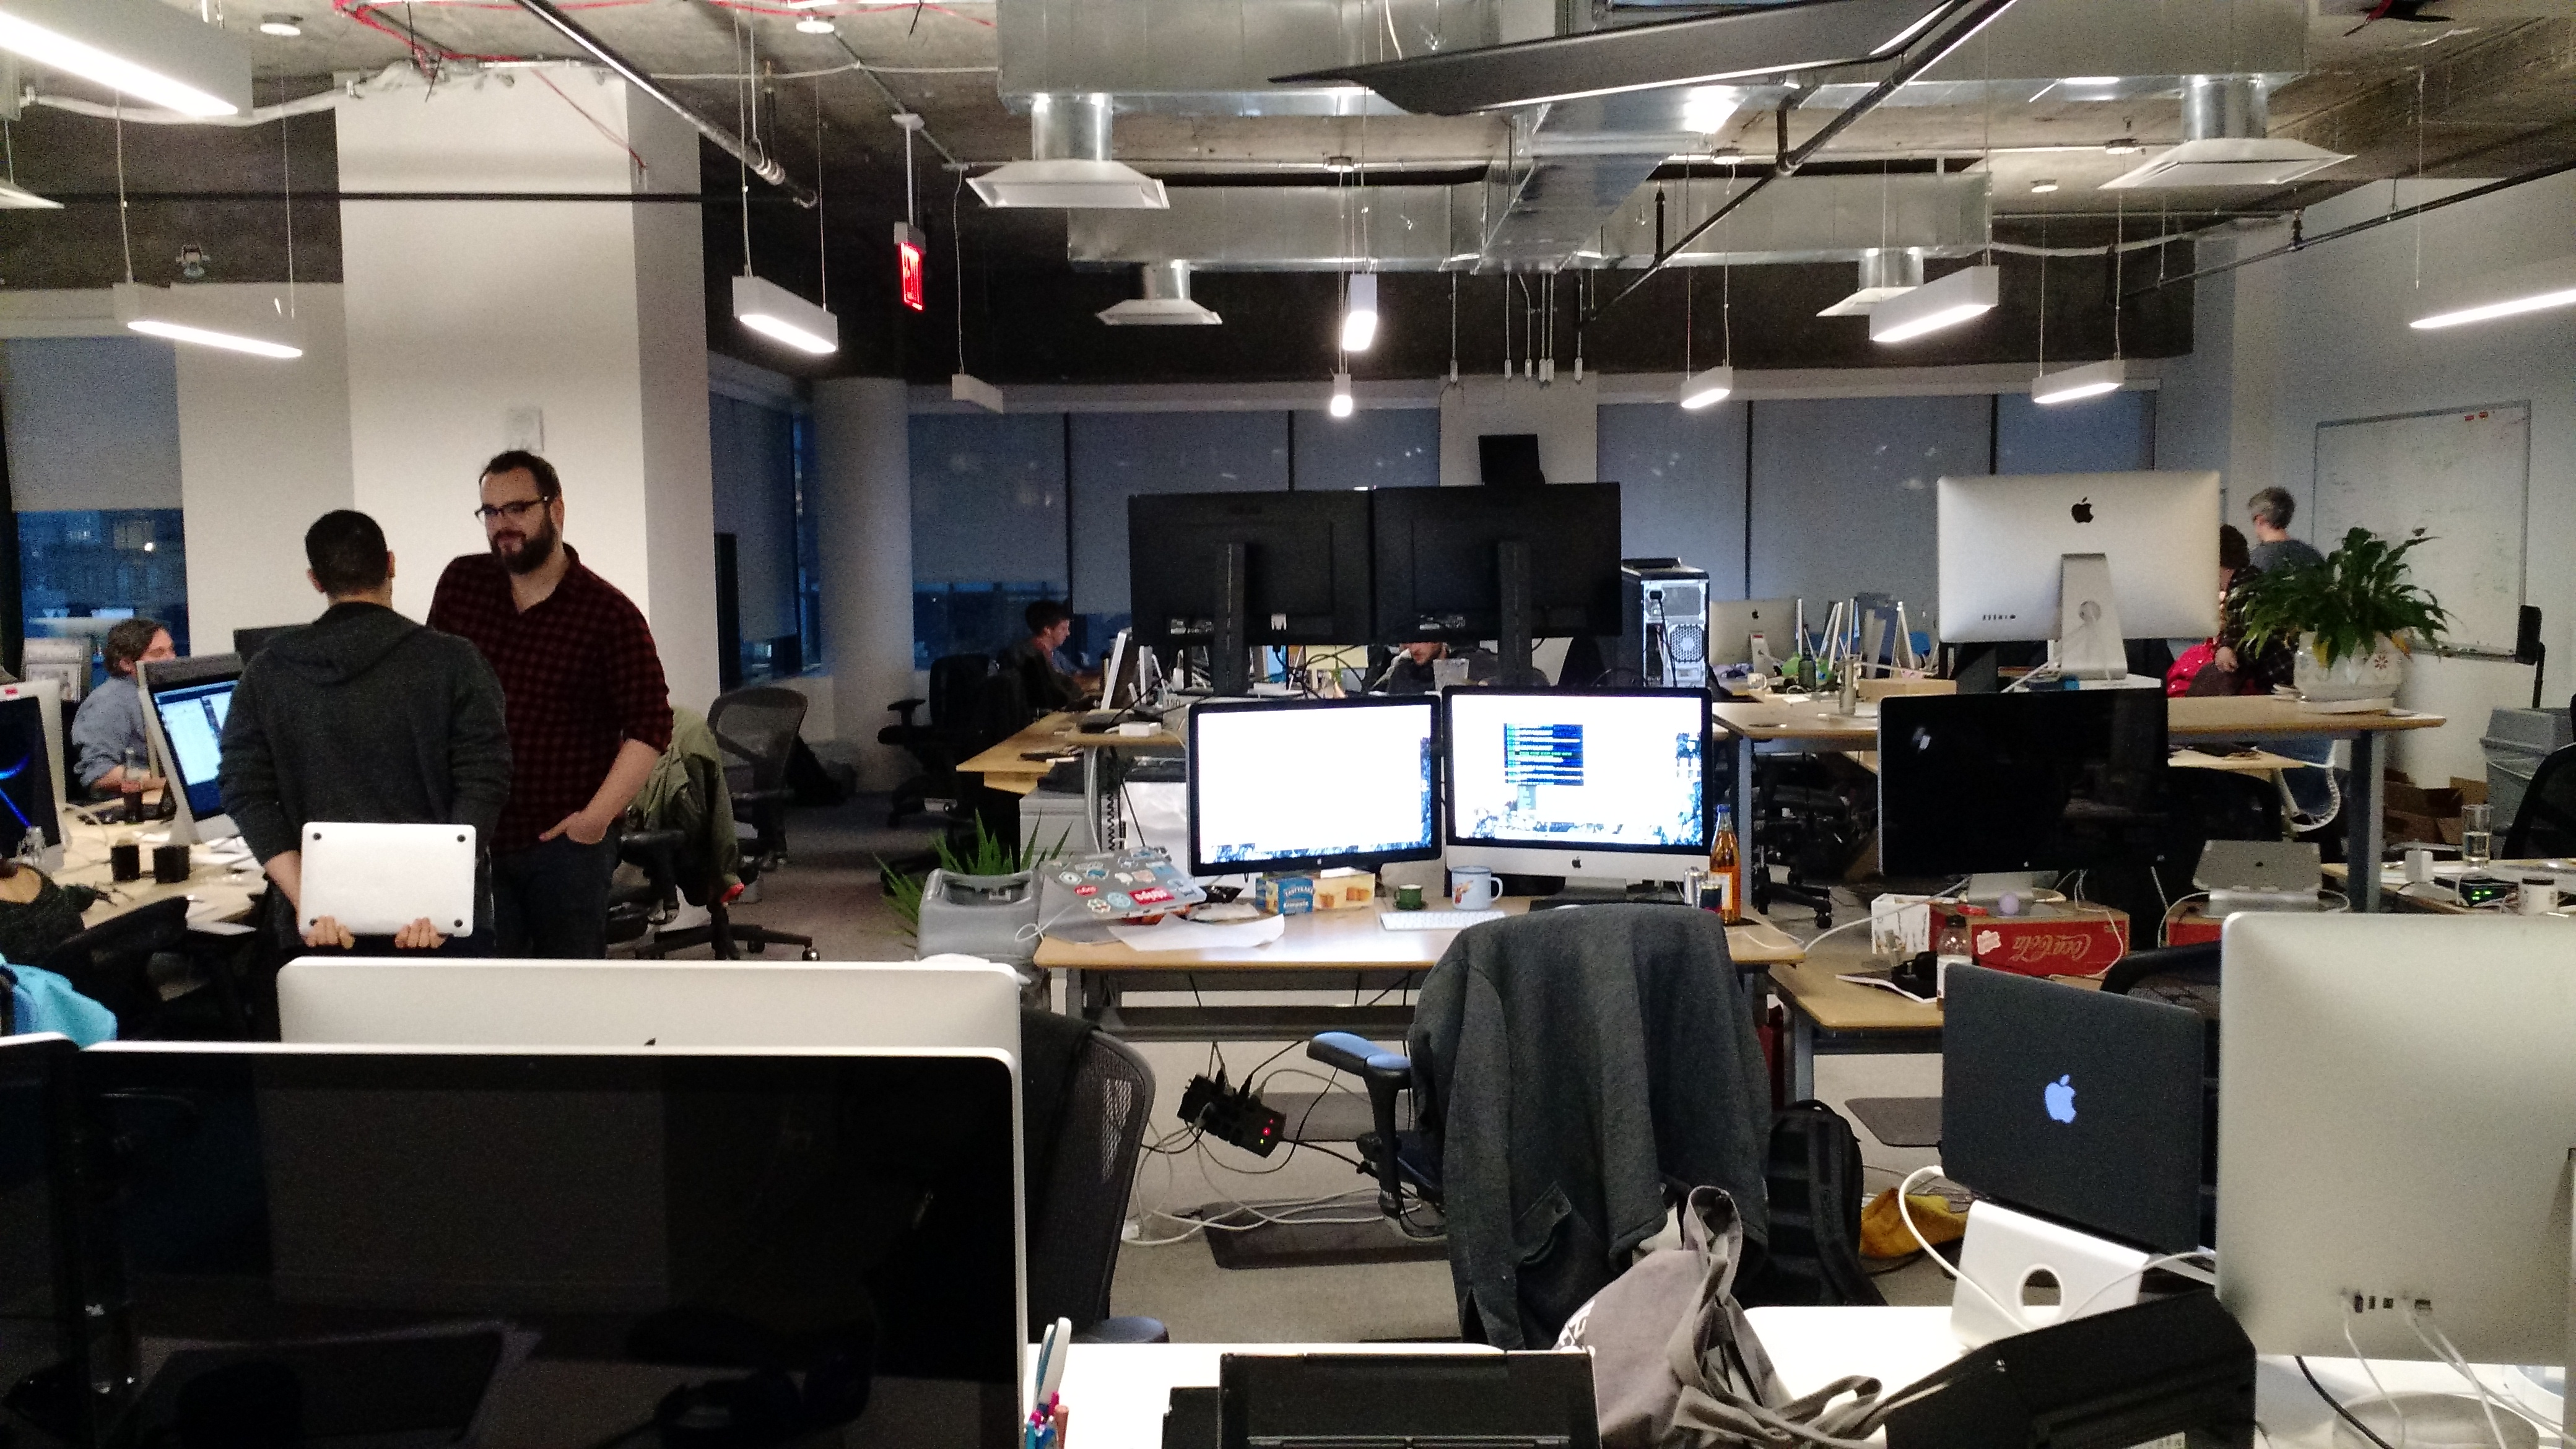 The DigitalOcean headquarters in New York on Dec. 10.